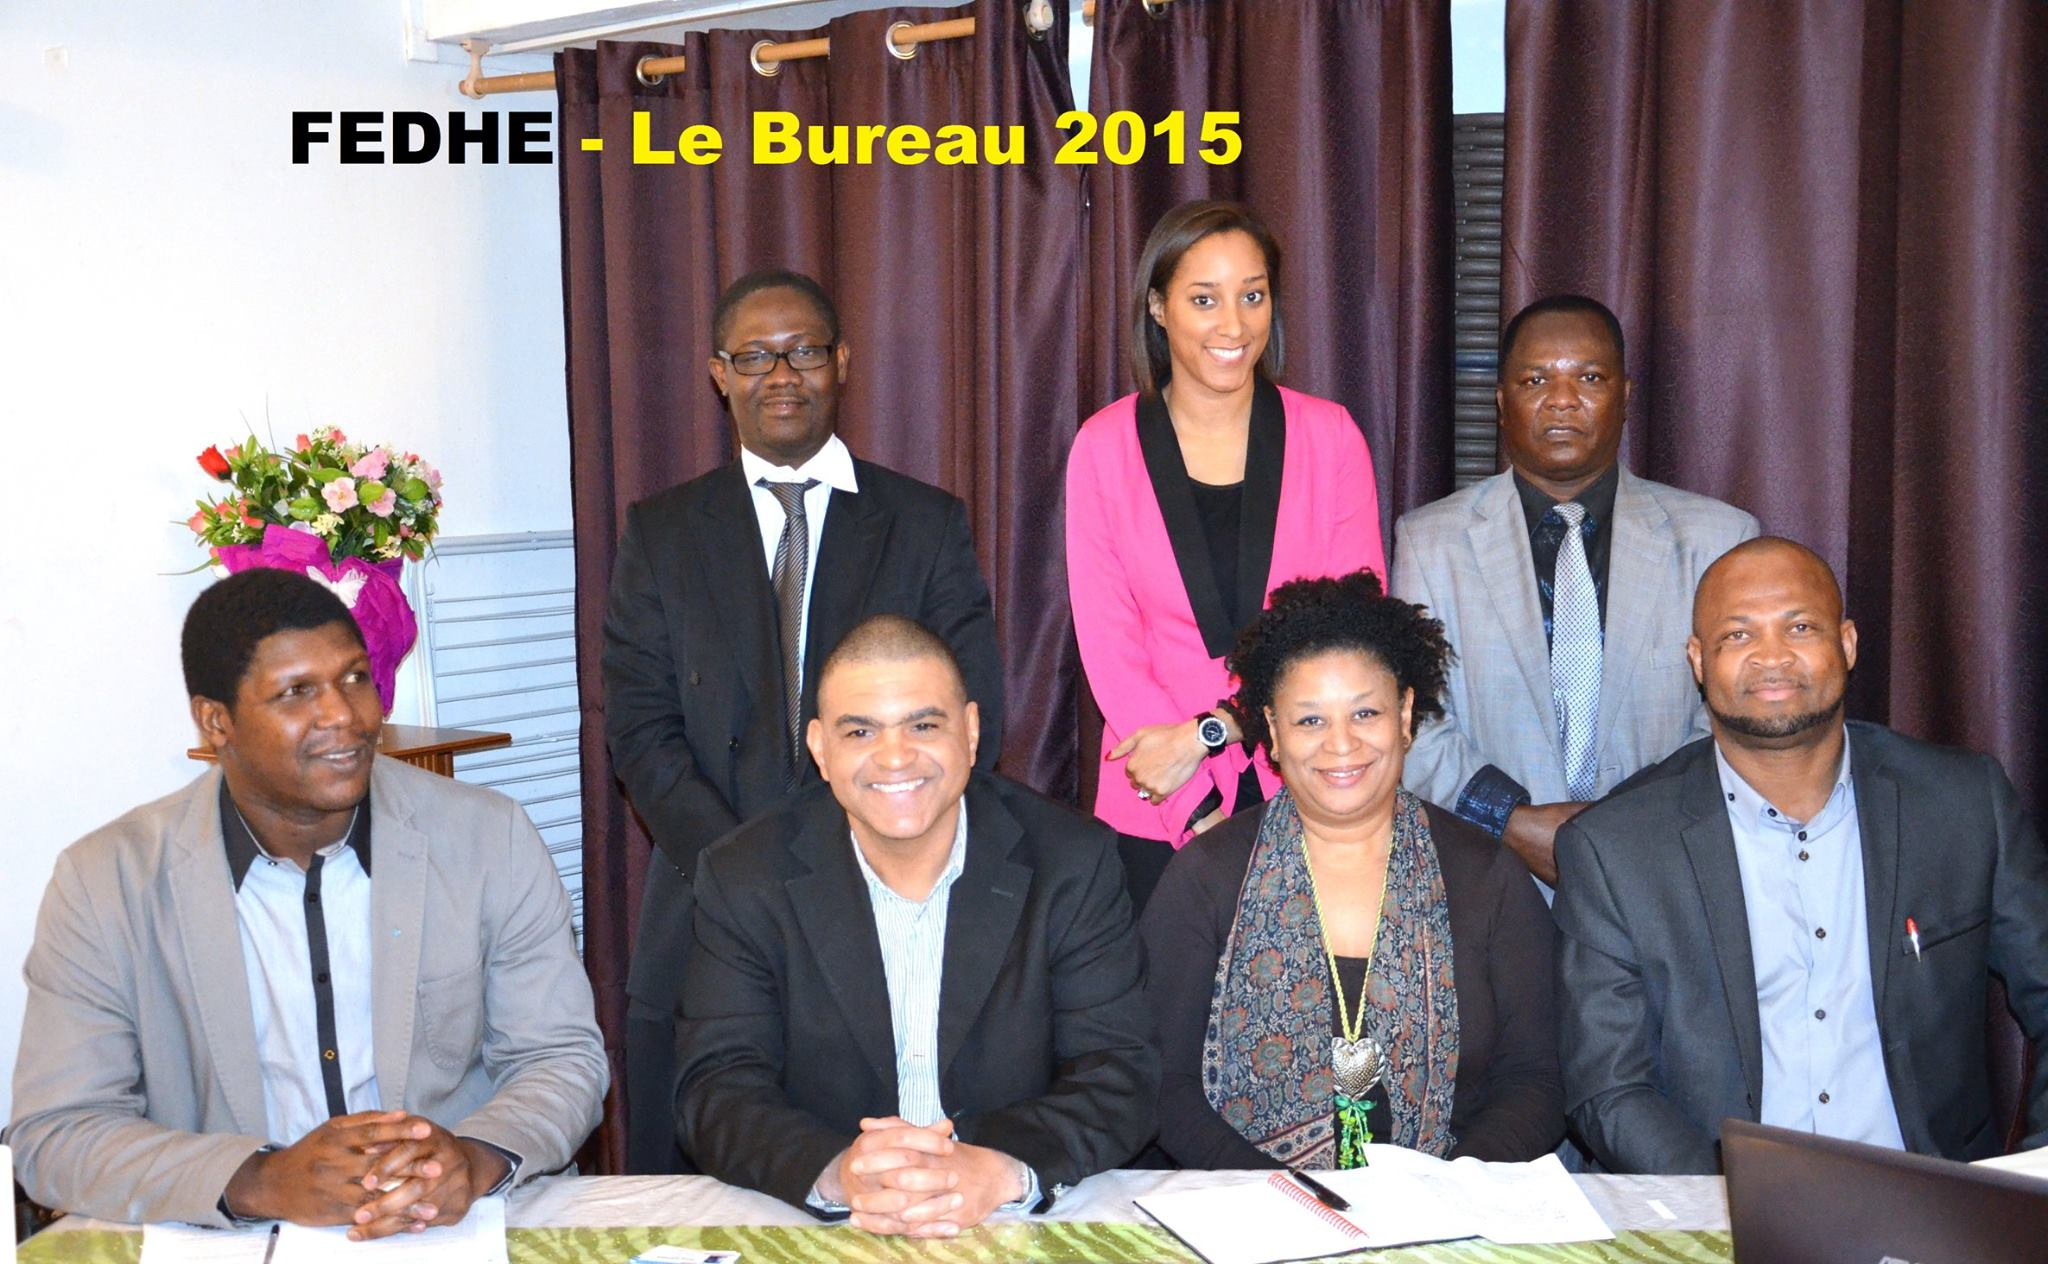 Bureau_FEDHE_2015